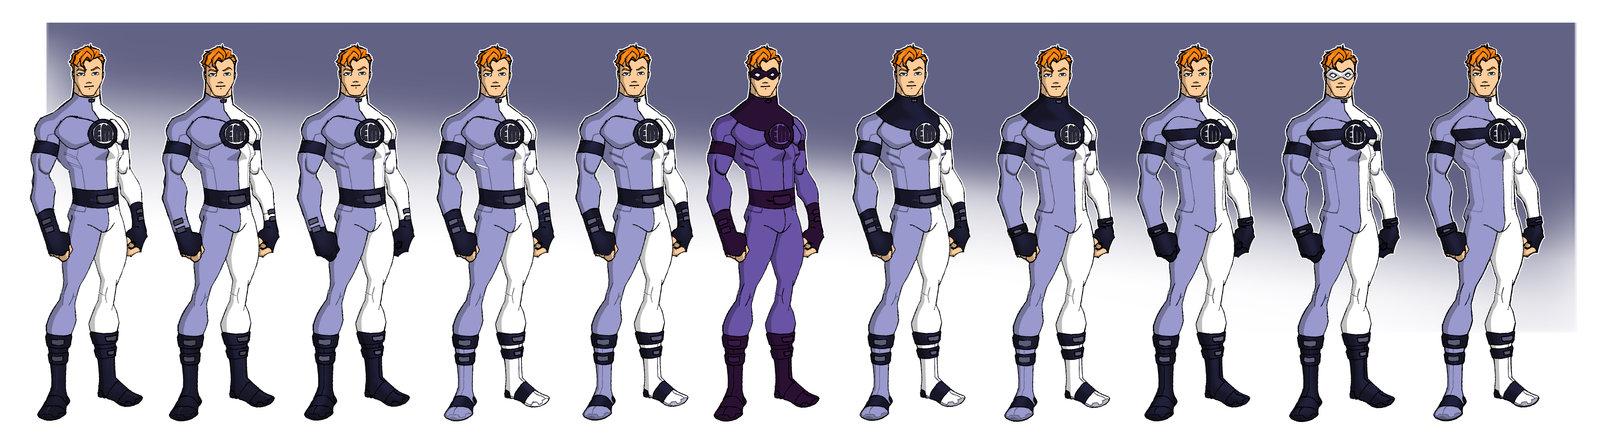 Character Design Hire : Ralph dibny the world famous elongated man deviantart update